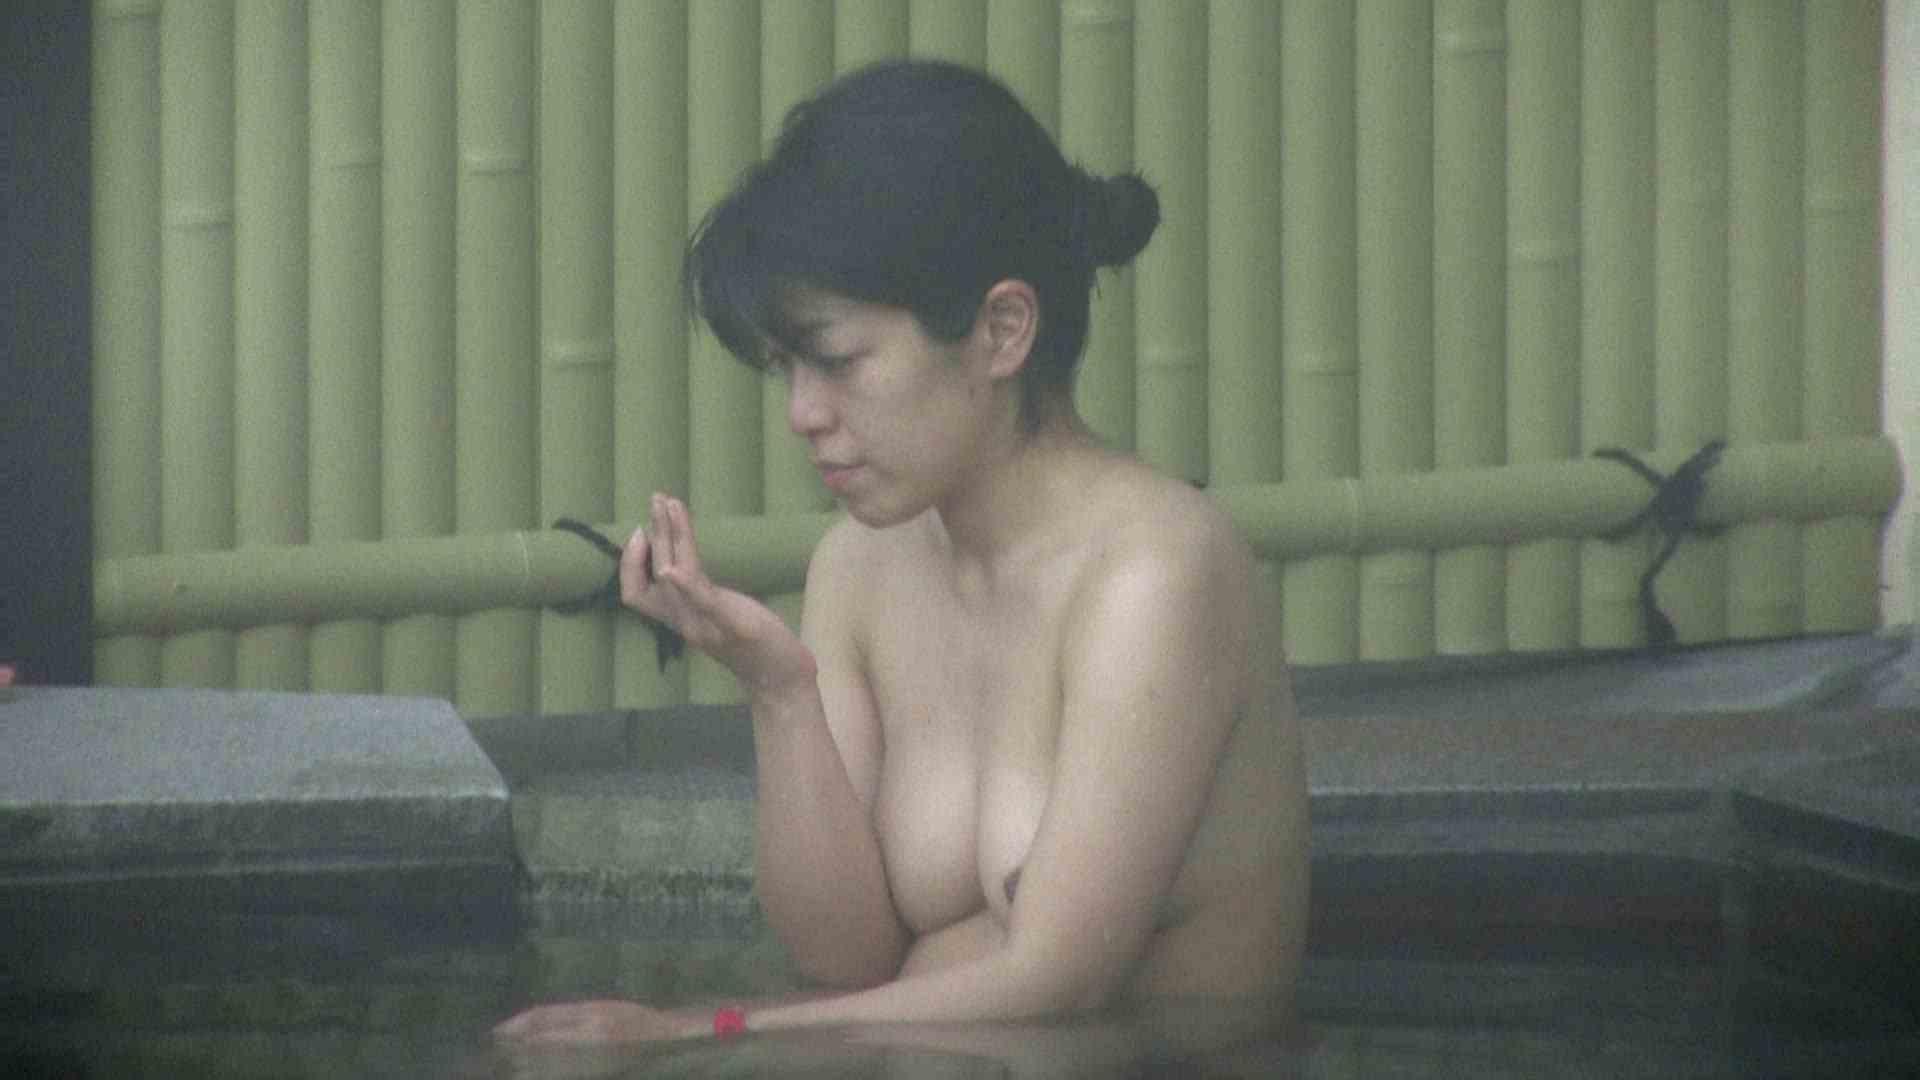 Aquaな露天風呂Vol.585 HなOL | 盗撮  93pic 53